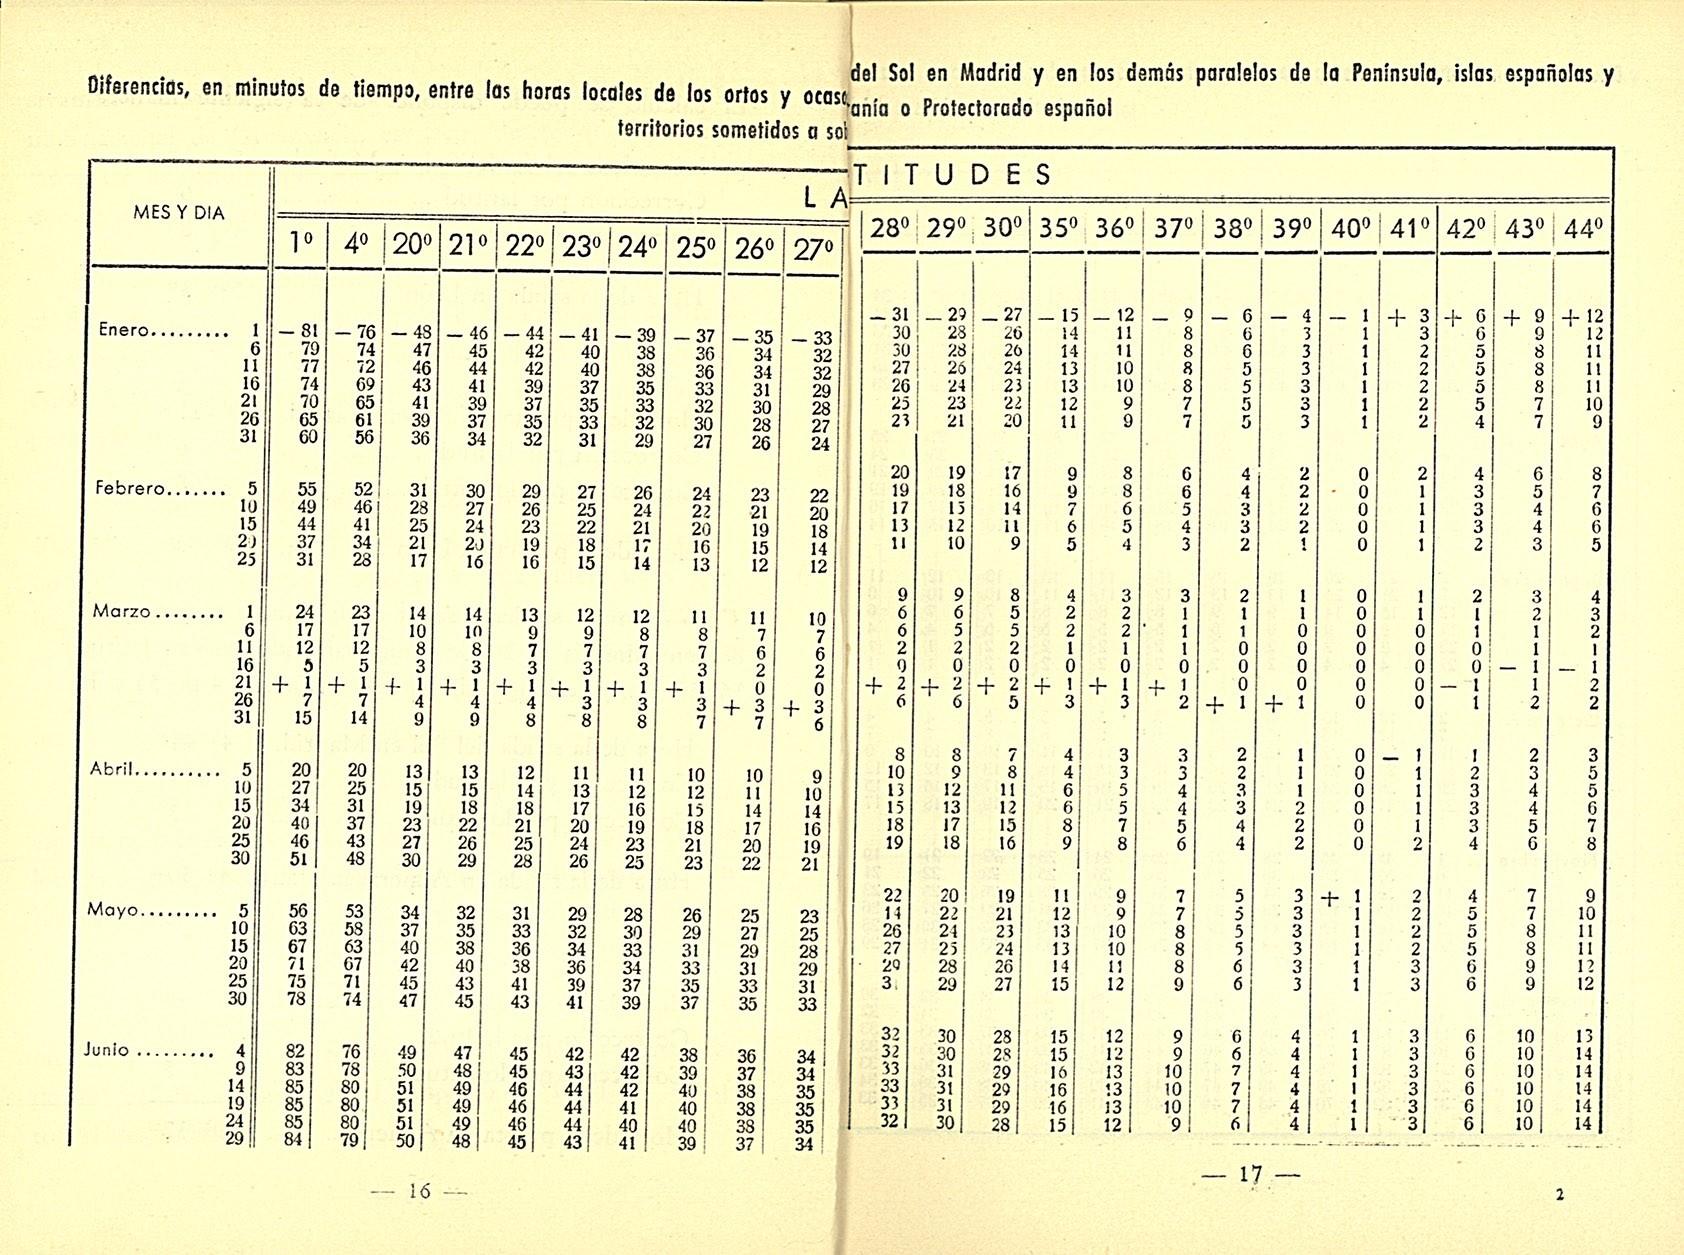 Imprimir Calendario 2019 Barcelona Recientes Arcims Calendario Meteorofenol³gico 1956 Of Imprimir Calendario 2019 Barcelona Más Reciente Calendarios 2018 Para Imprimir – Minimalista